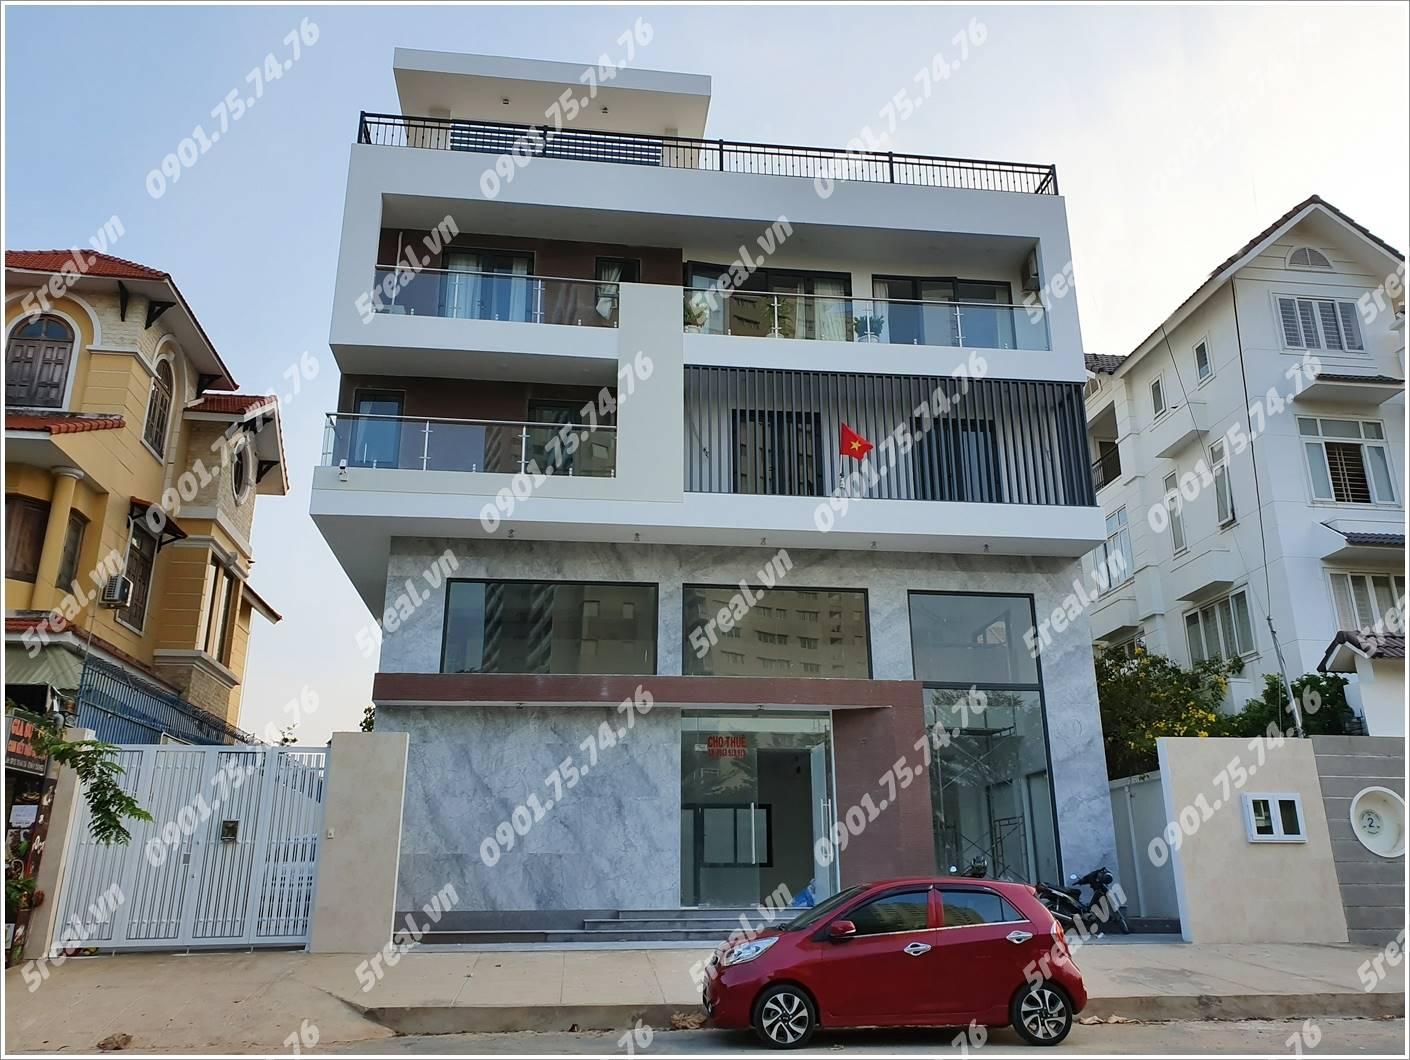 building-04-duong-so-66-phuong-thao-dien-quan-2-cho-thue-van-phong-tphcm-5real.vn-01